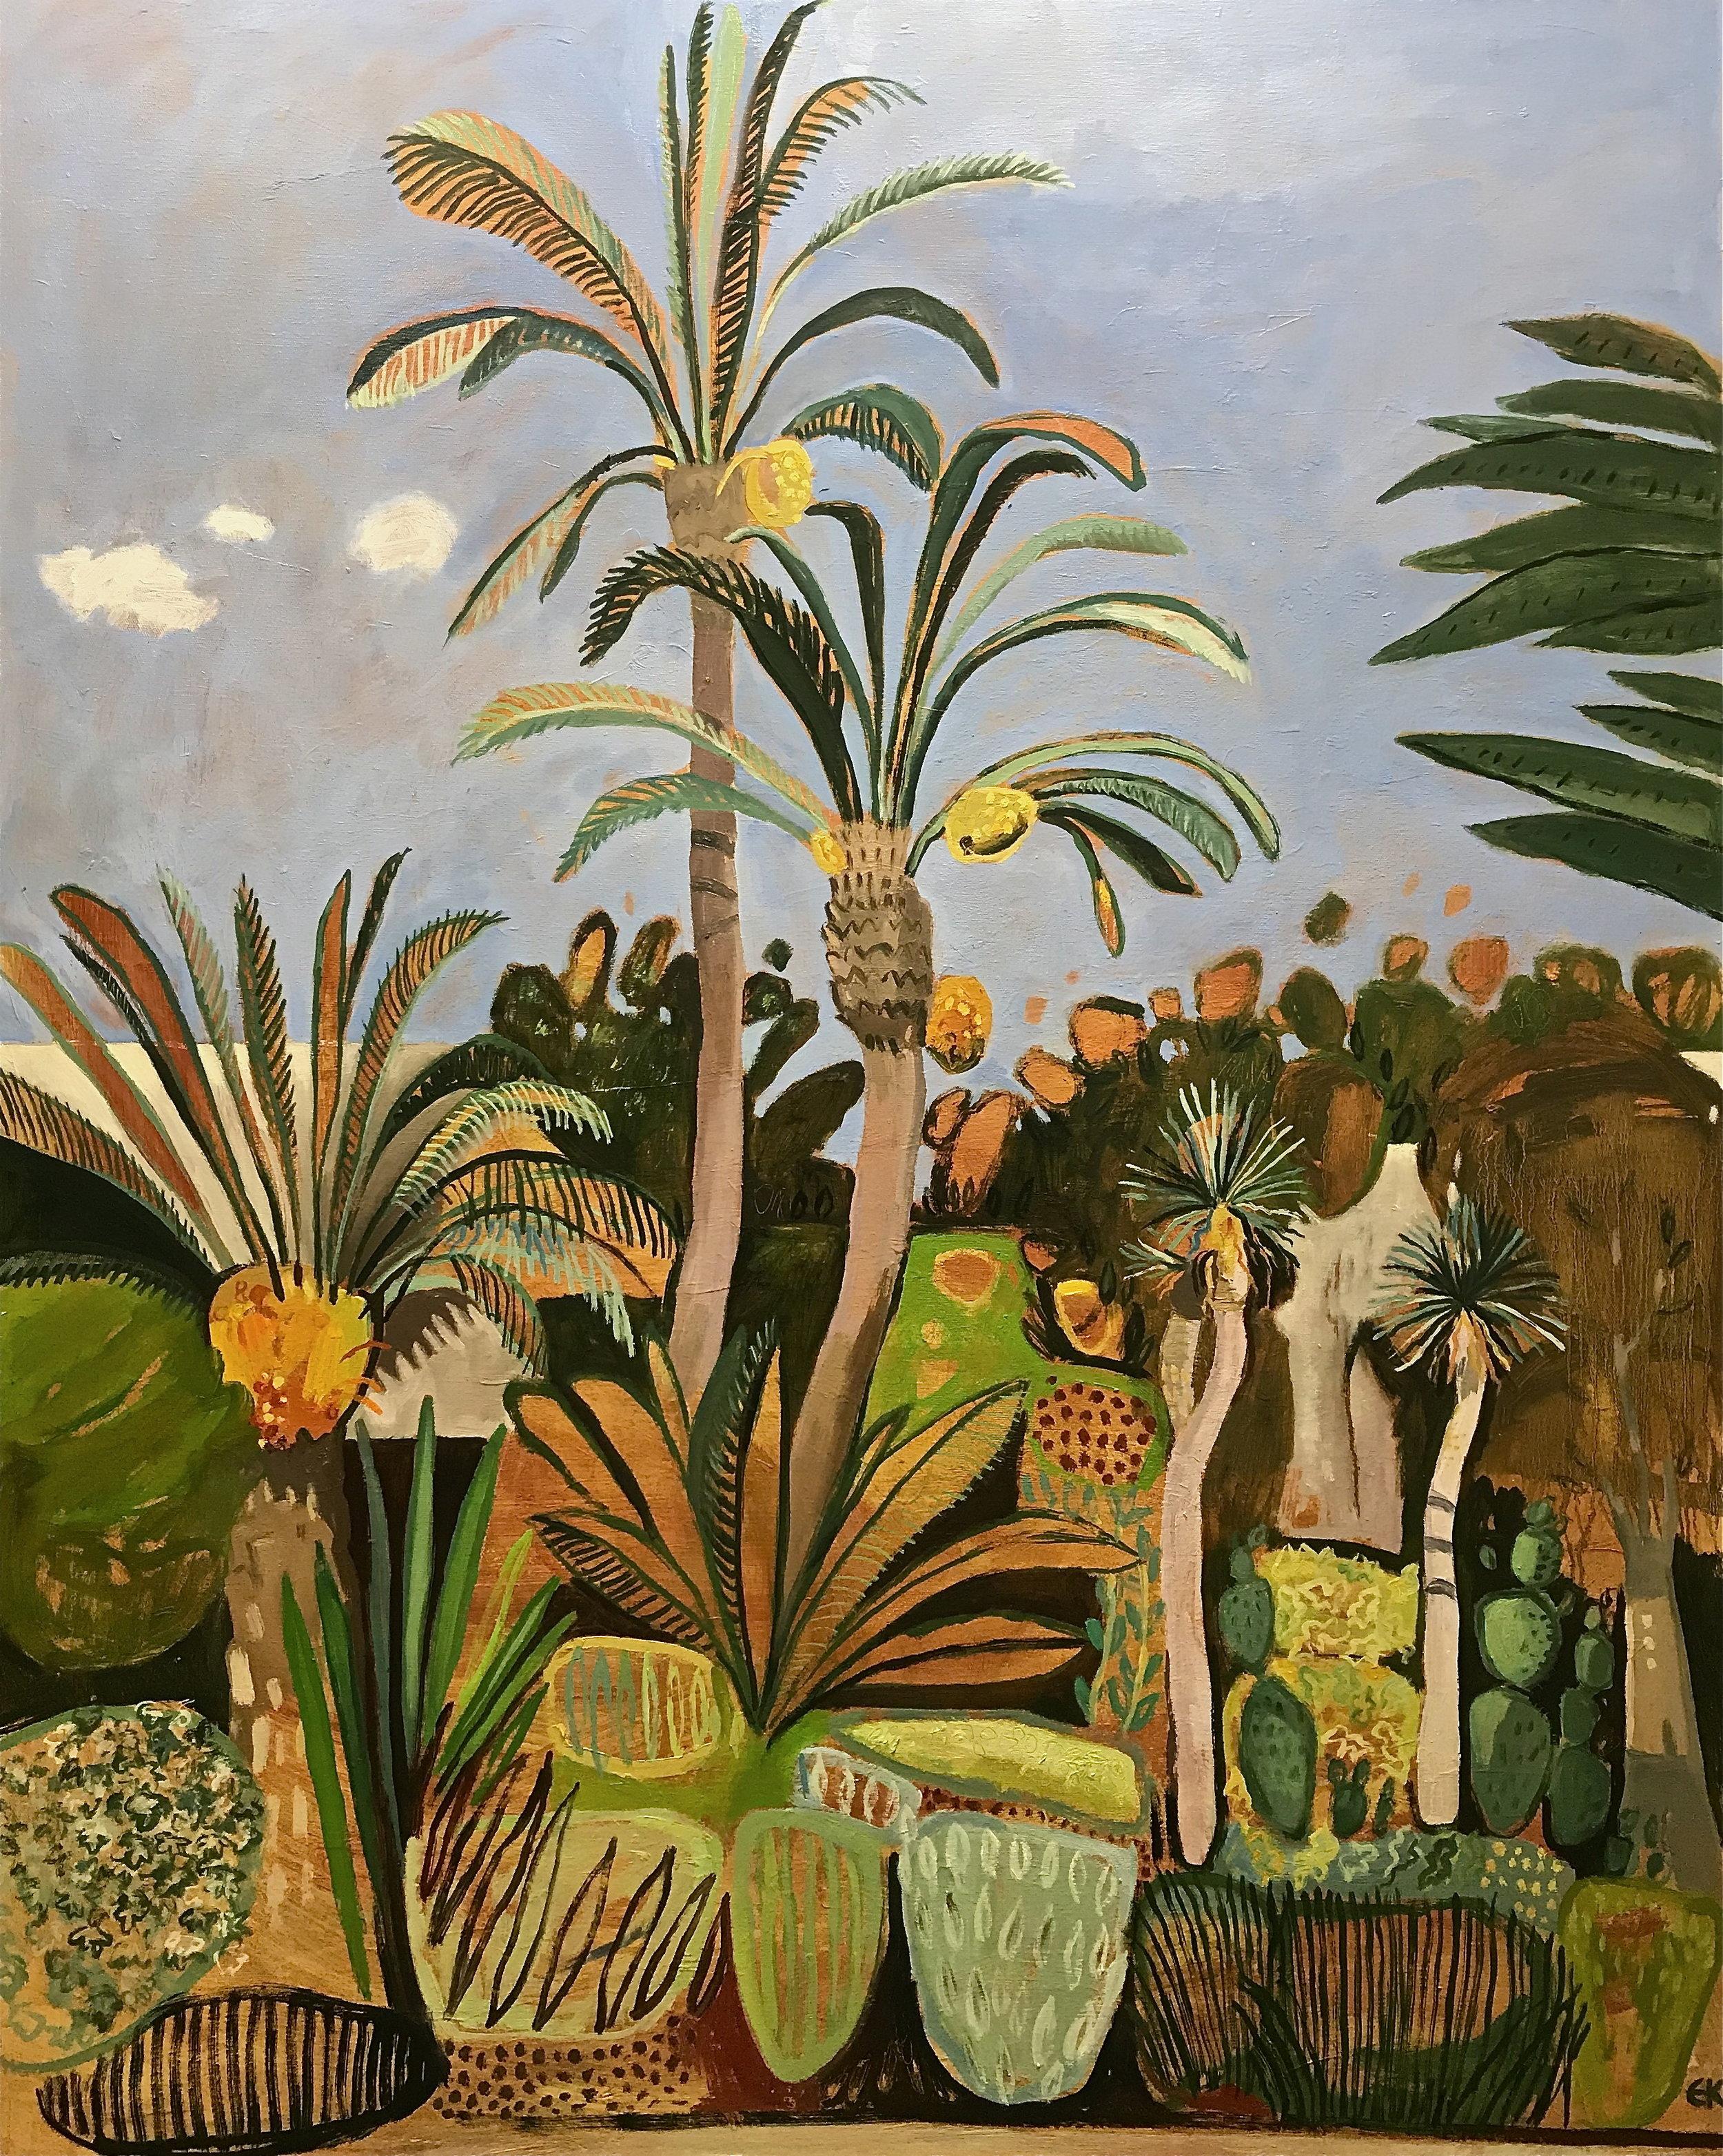 Le Jardin Secret with Tall Date Palms, Marrakech